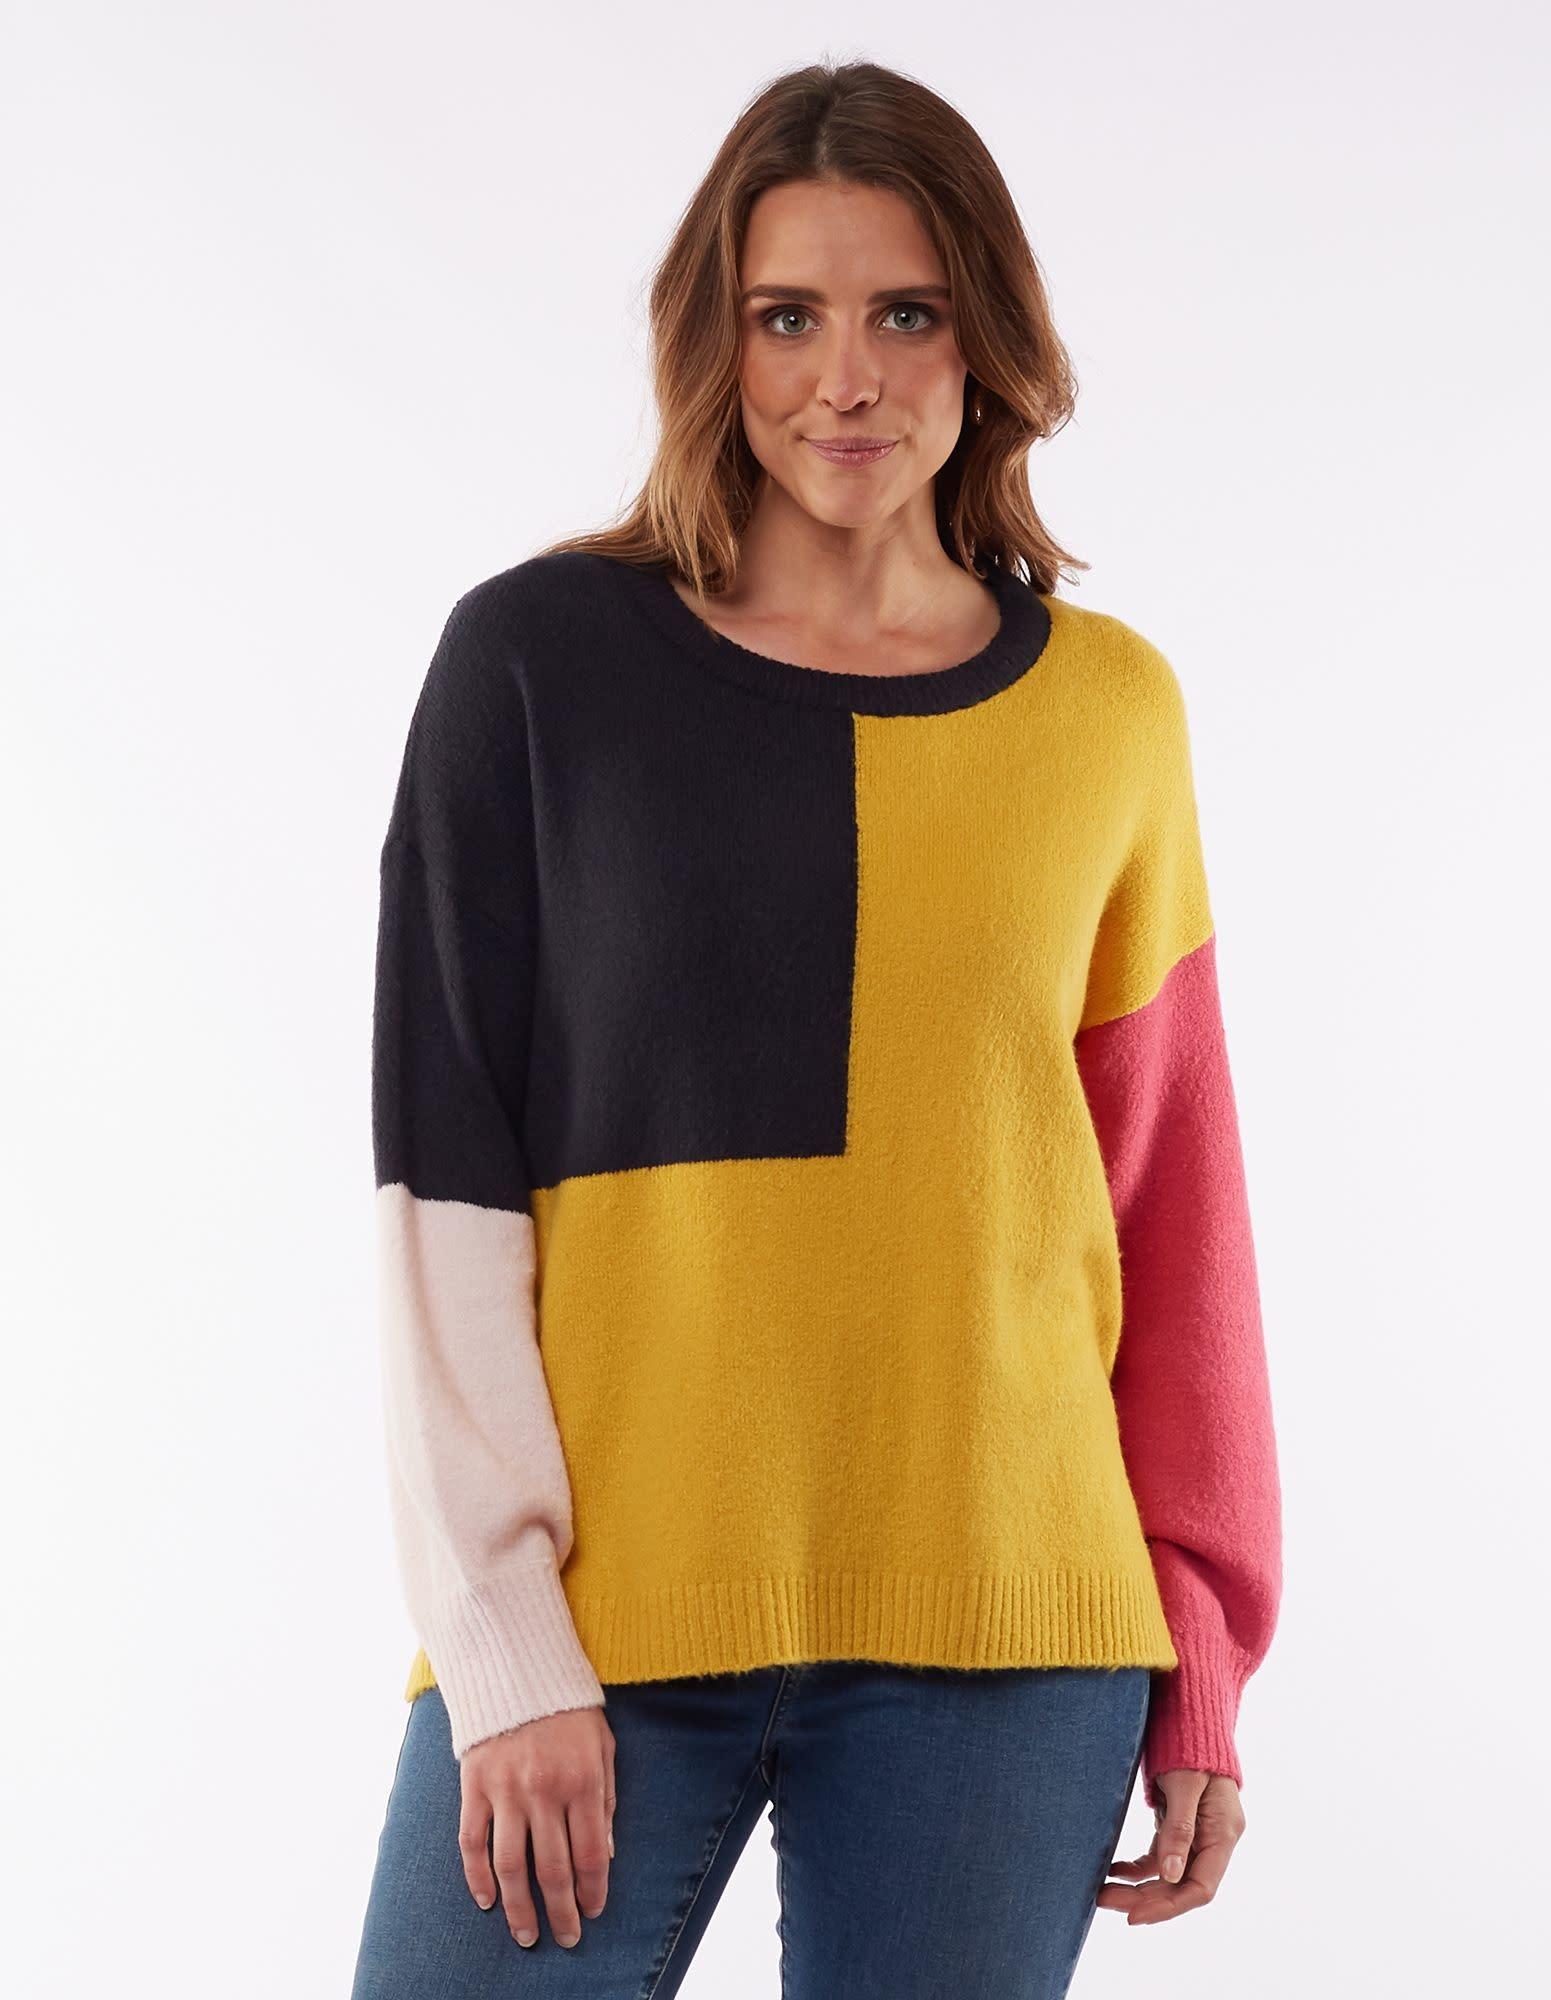 Elm Shallows Knit